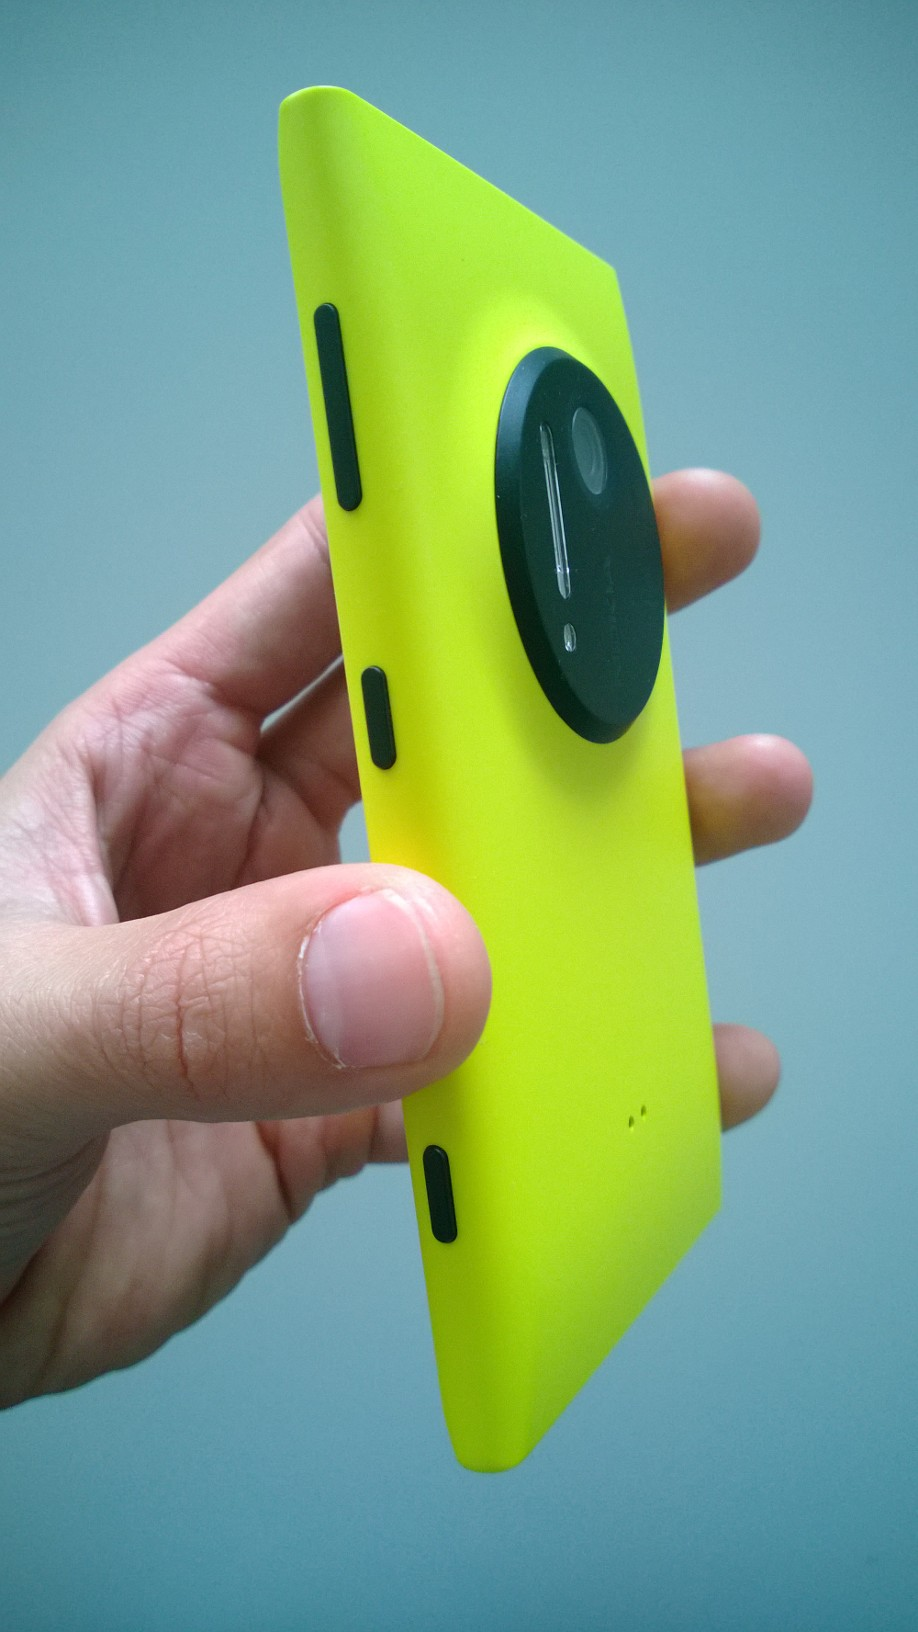 Benvenuto Lumia 1020! C'era una volta la fotocamera..